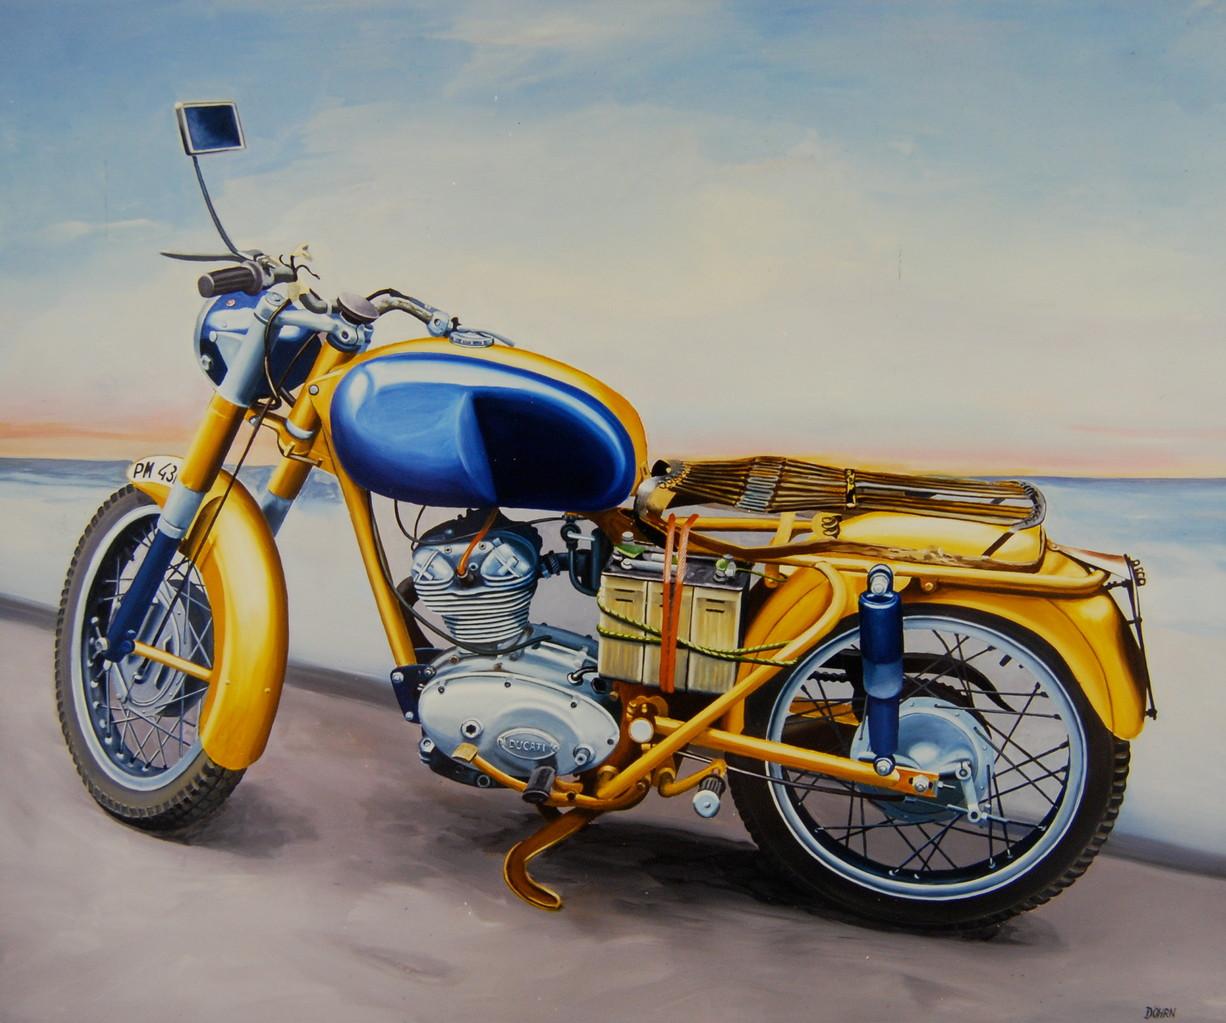 Ducati, 1982, 160 x 130, Privatsammlung